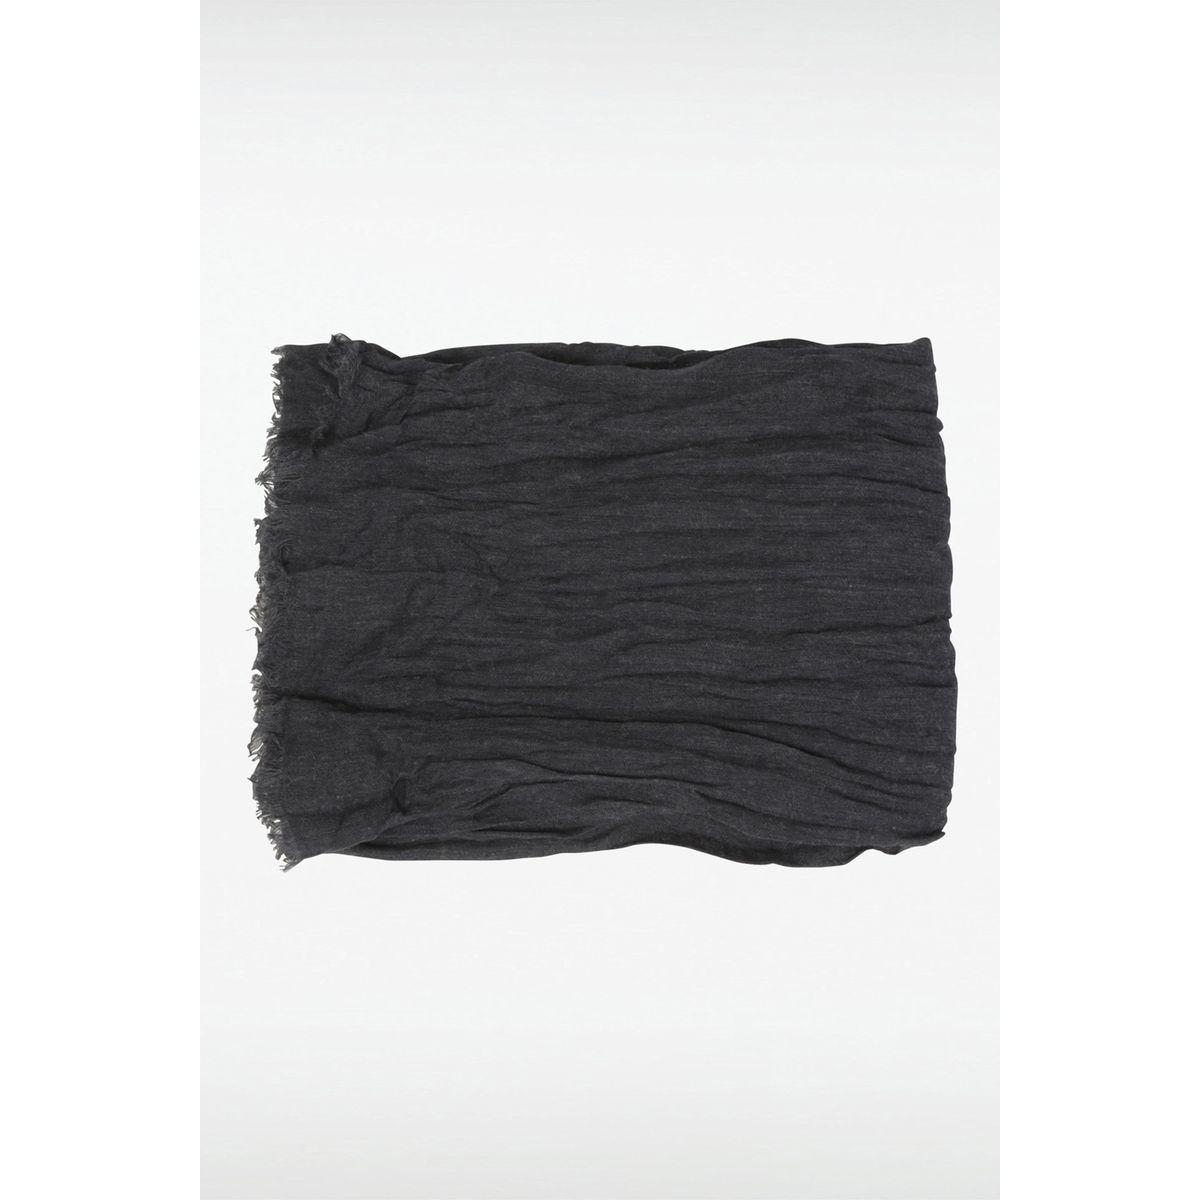 Foulard à frange courte